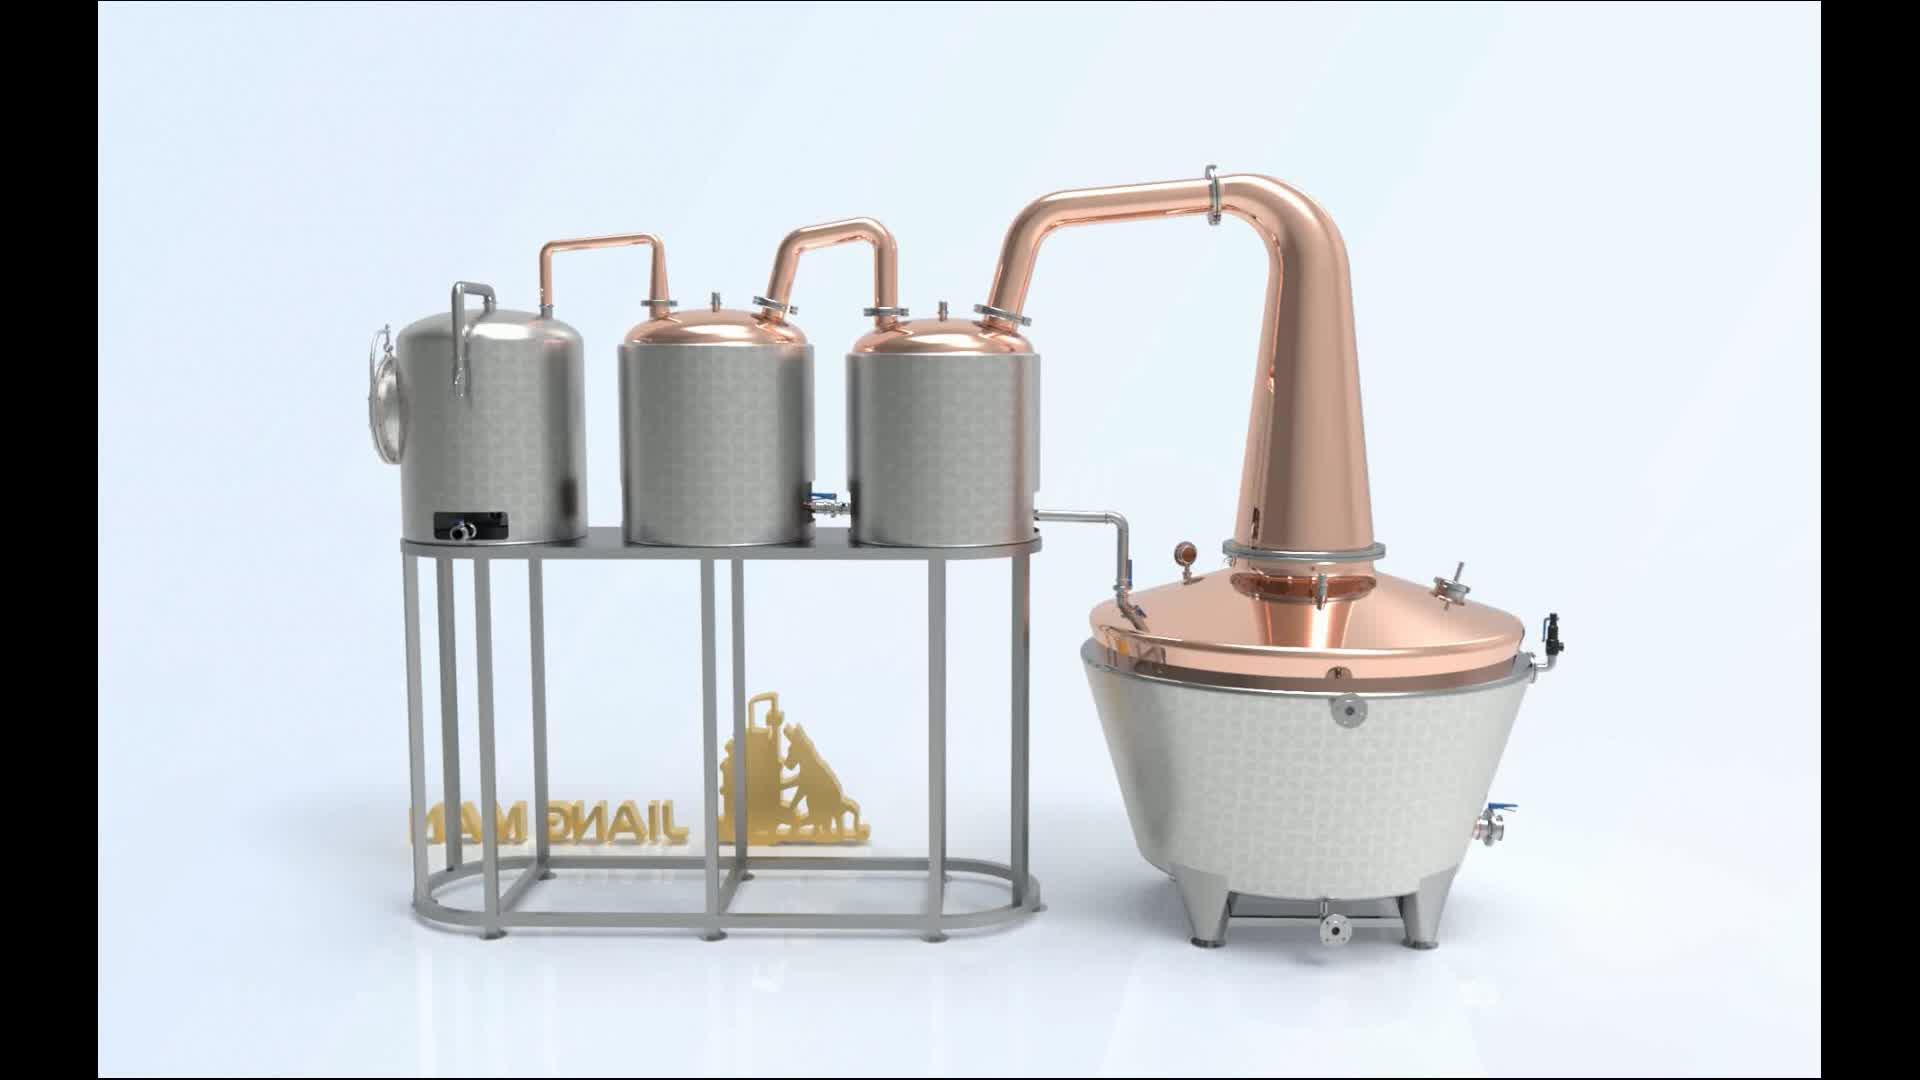 [JiangMan]-900L तांबा आसवनी उपकरण-तांबे के बर्तन शराब खींचनेवाला-कैरेबियन रम आसवन अभी भी-डबल Thumper रम आसवनी